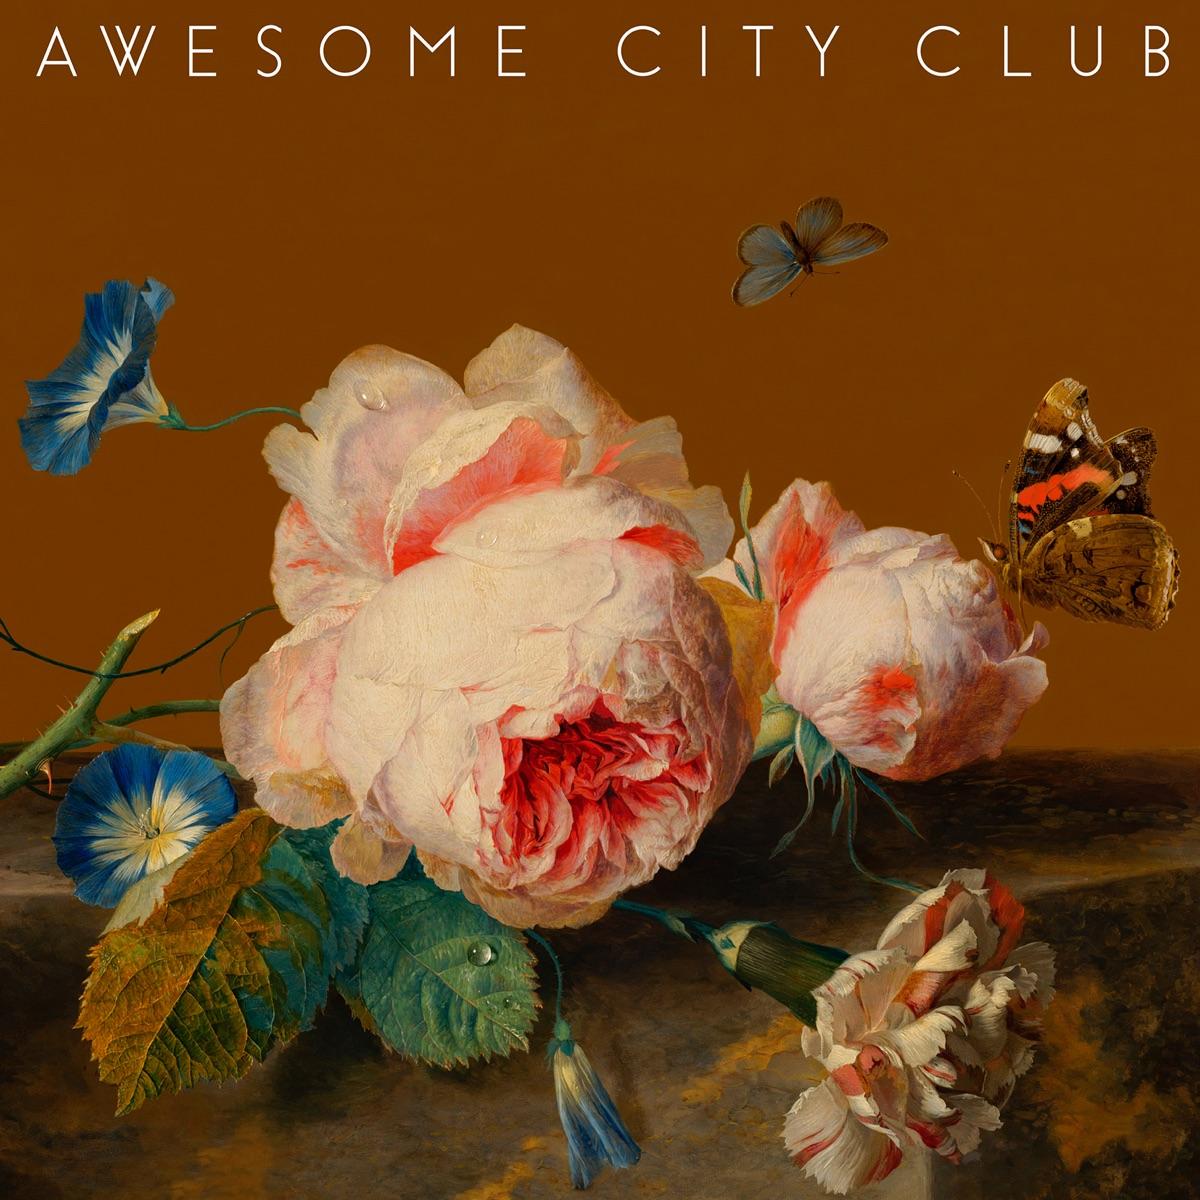 『Awesome City Club - またたき』収録の『またたき』ジャケット